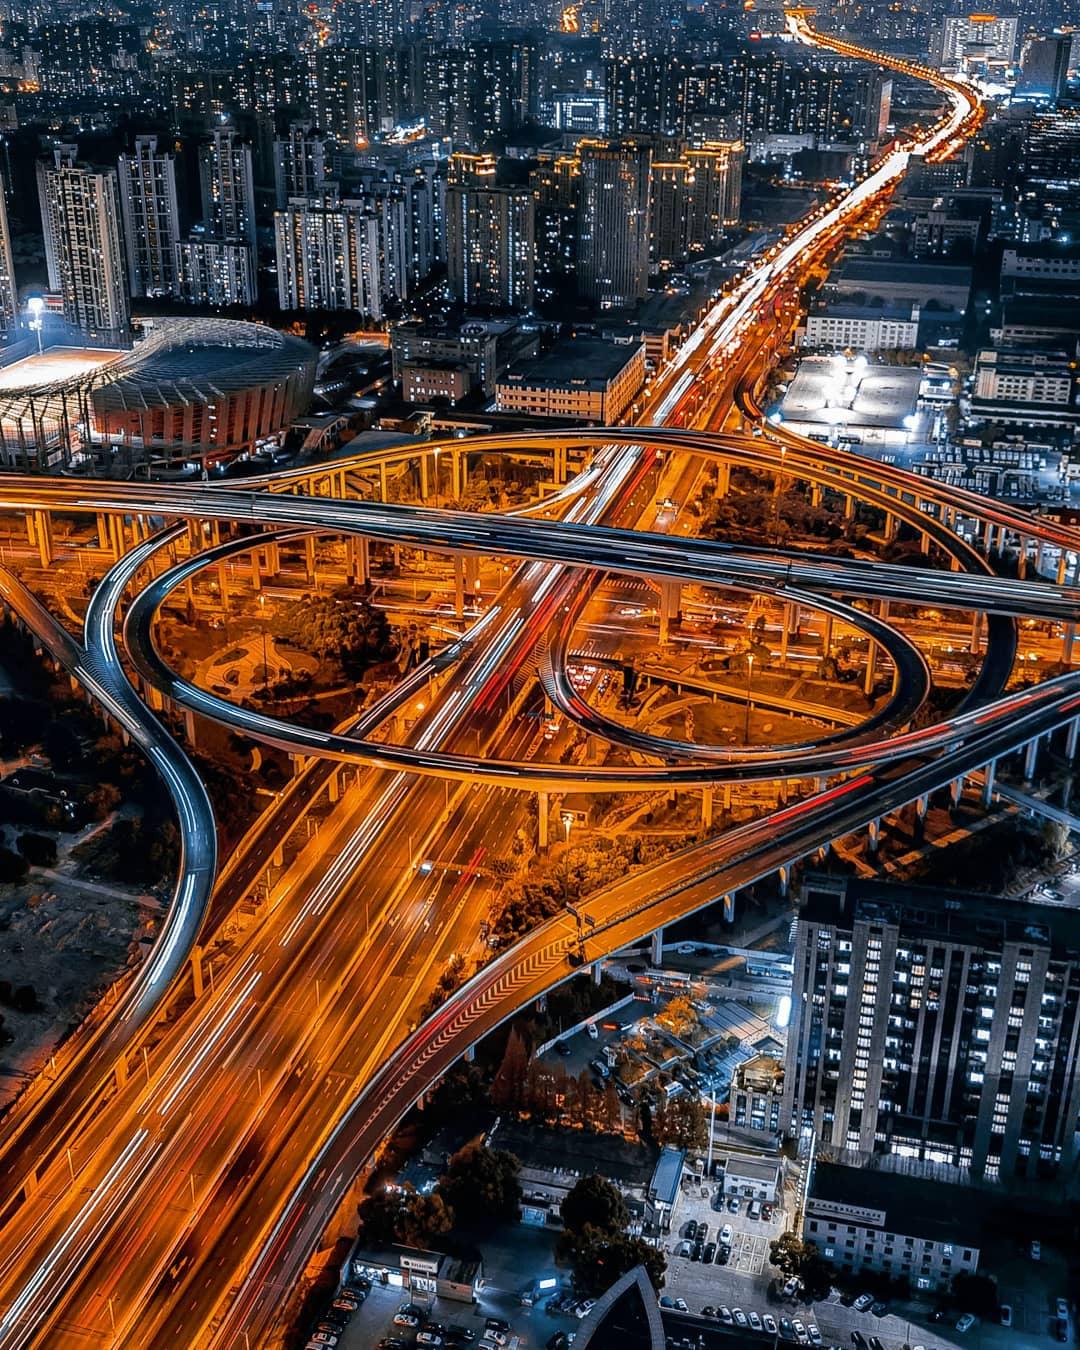 Shanghai Cityscape Photography by Mark Siegemund